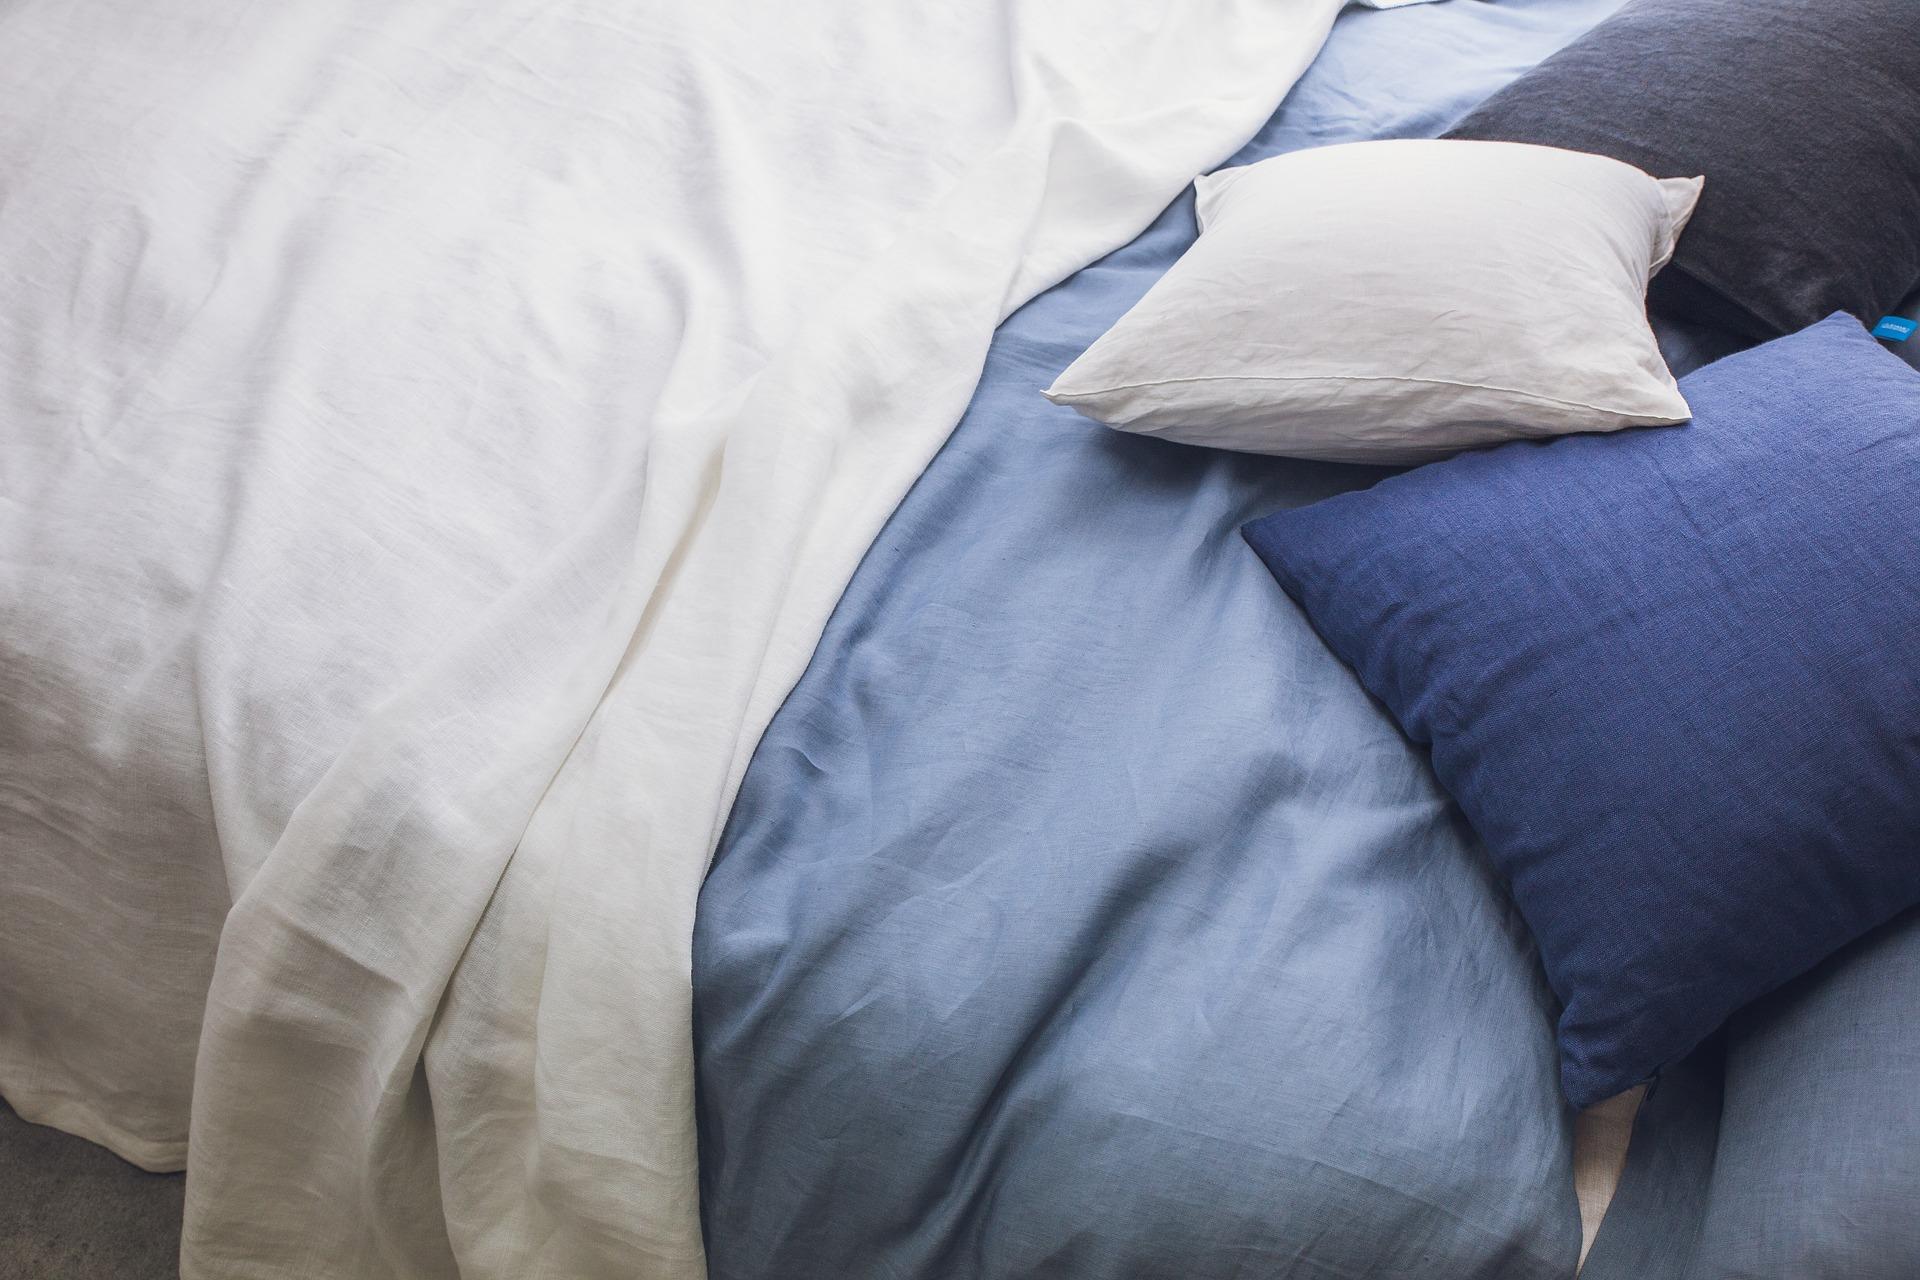 bedding-3528078_1920